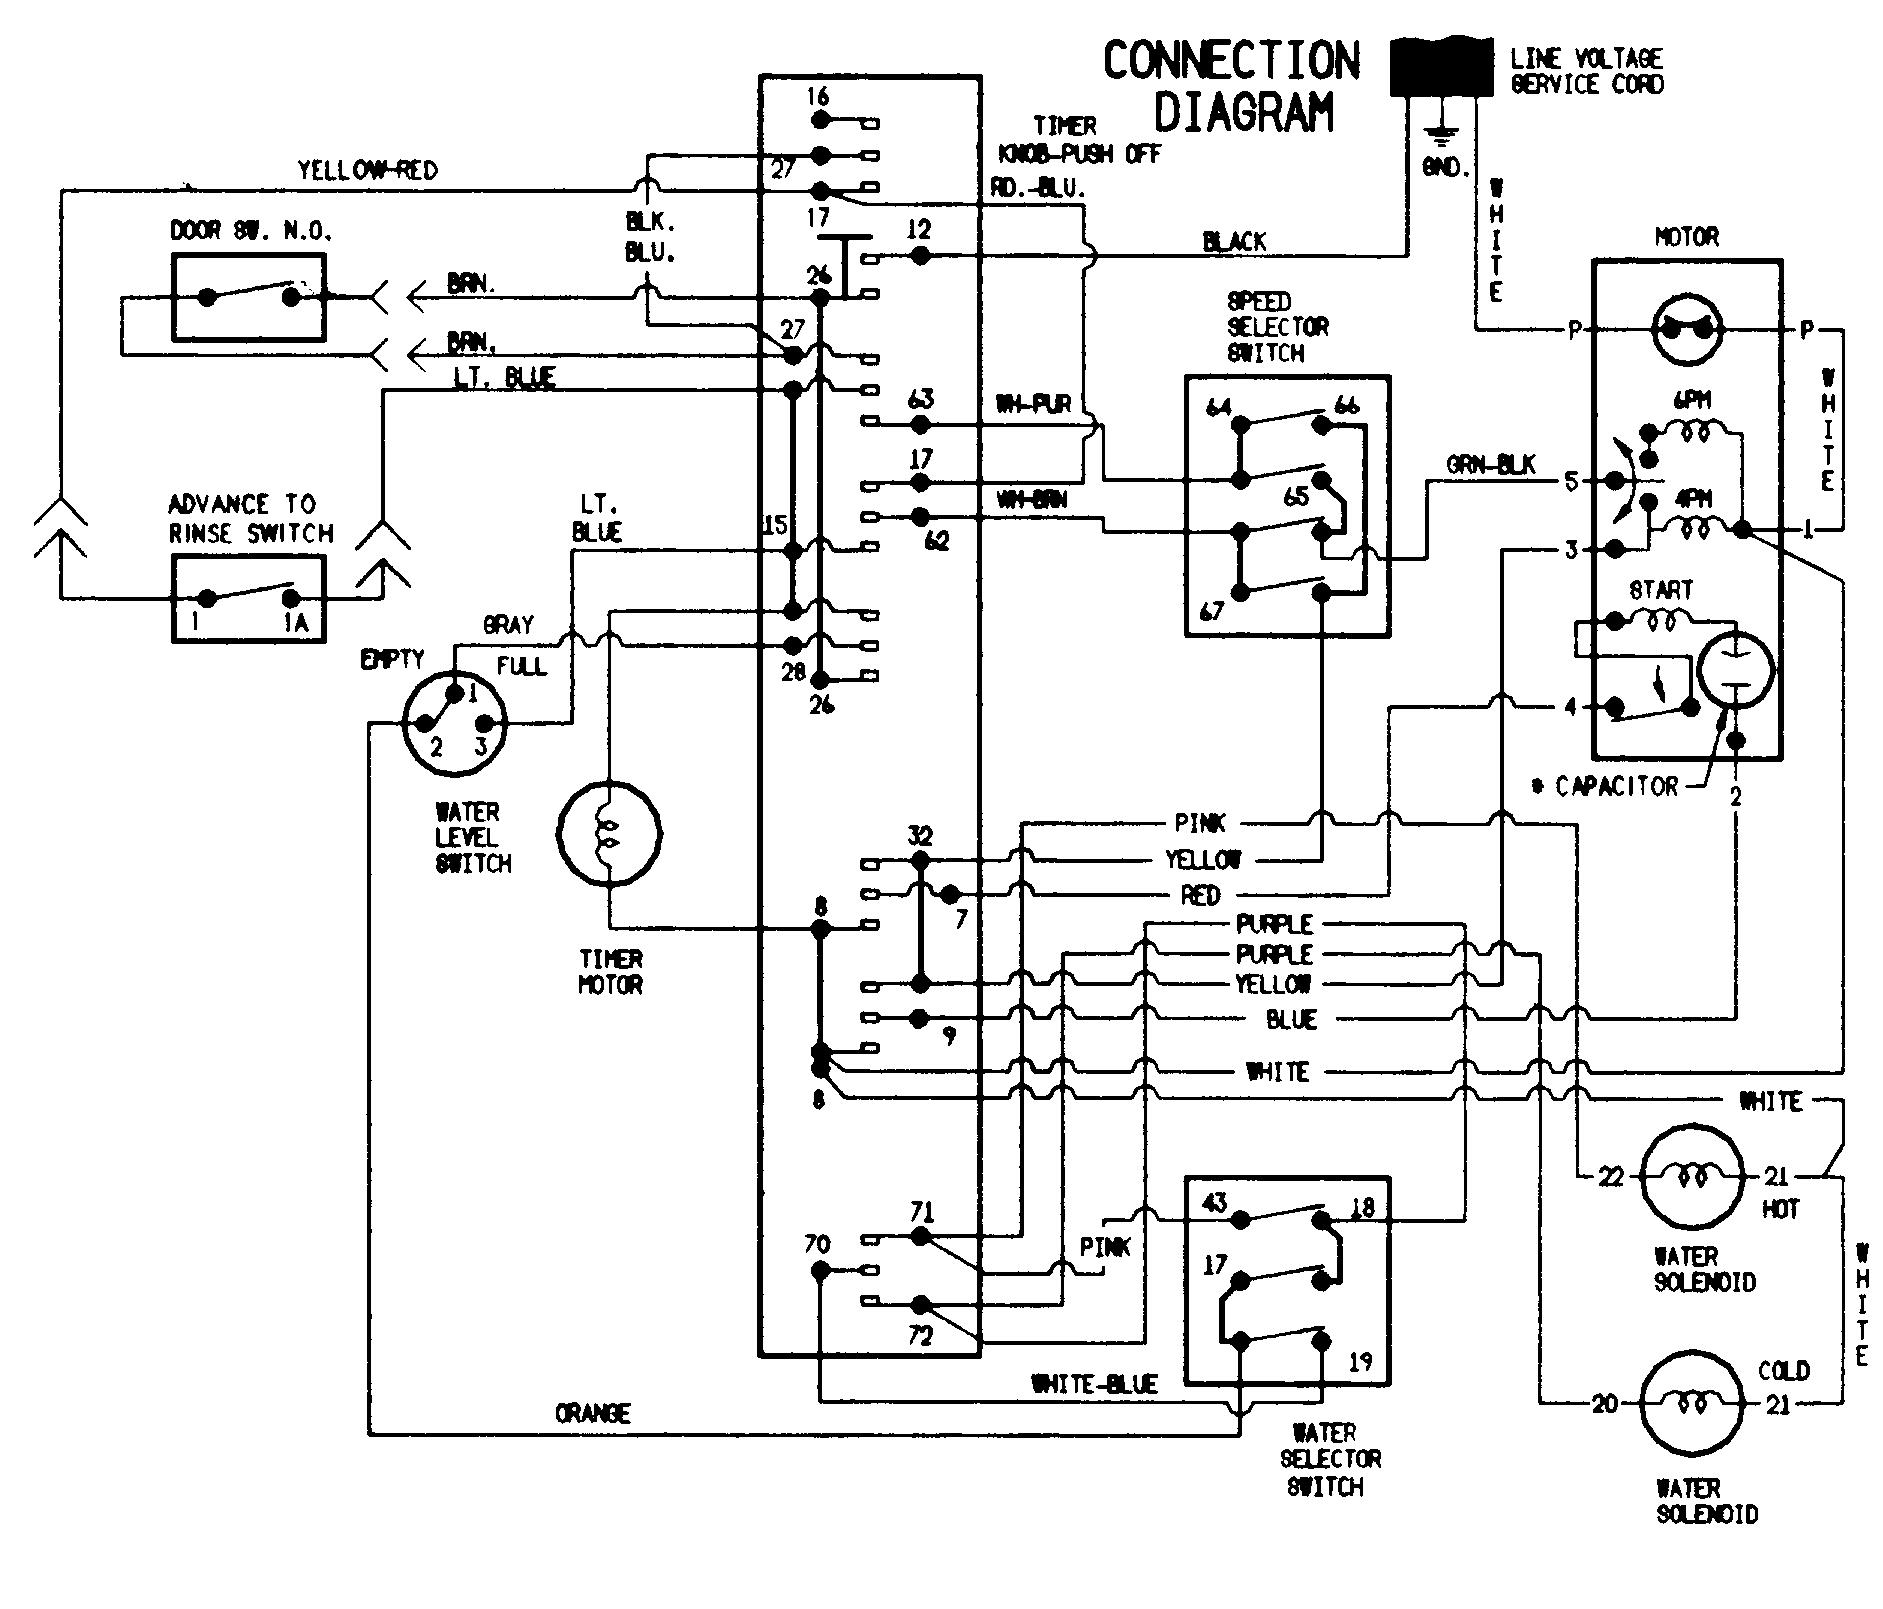 Jeep Hurricane Wiring Diagram T568a Wire Diagram Jeep 258 Engine – Lithium Powered Xb-300li Wire Diagram